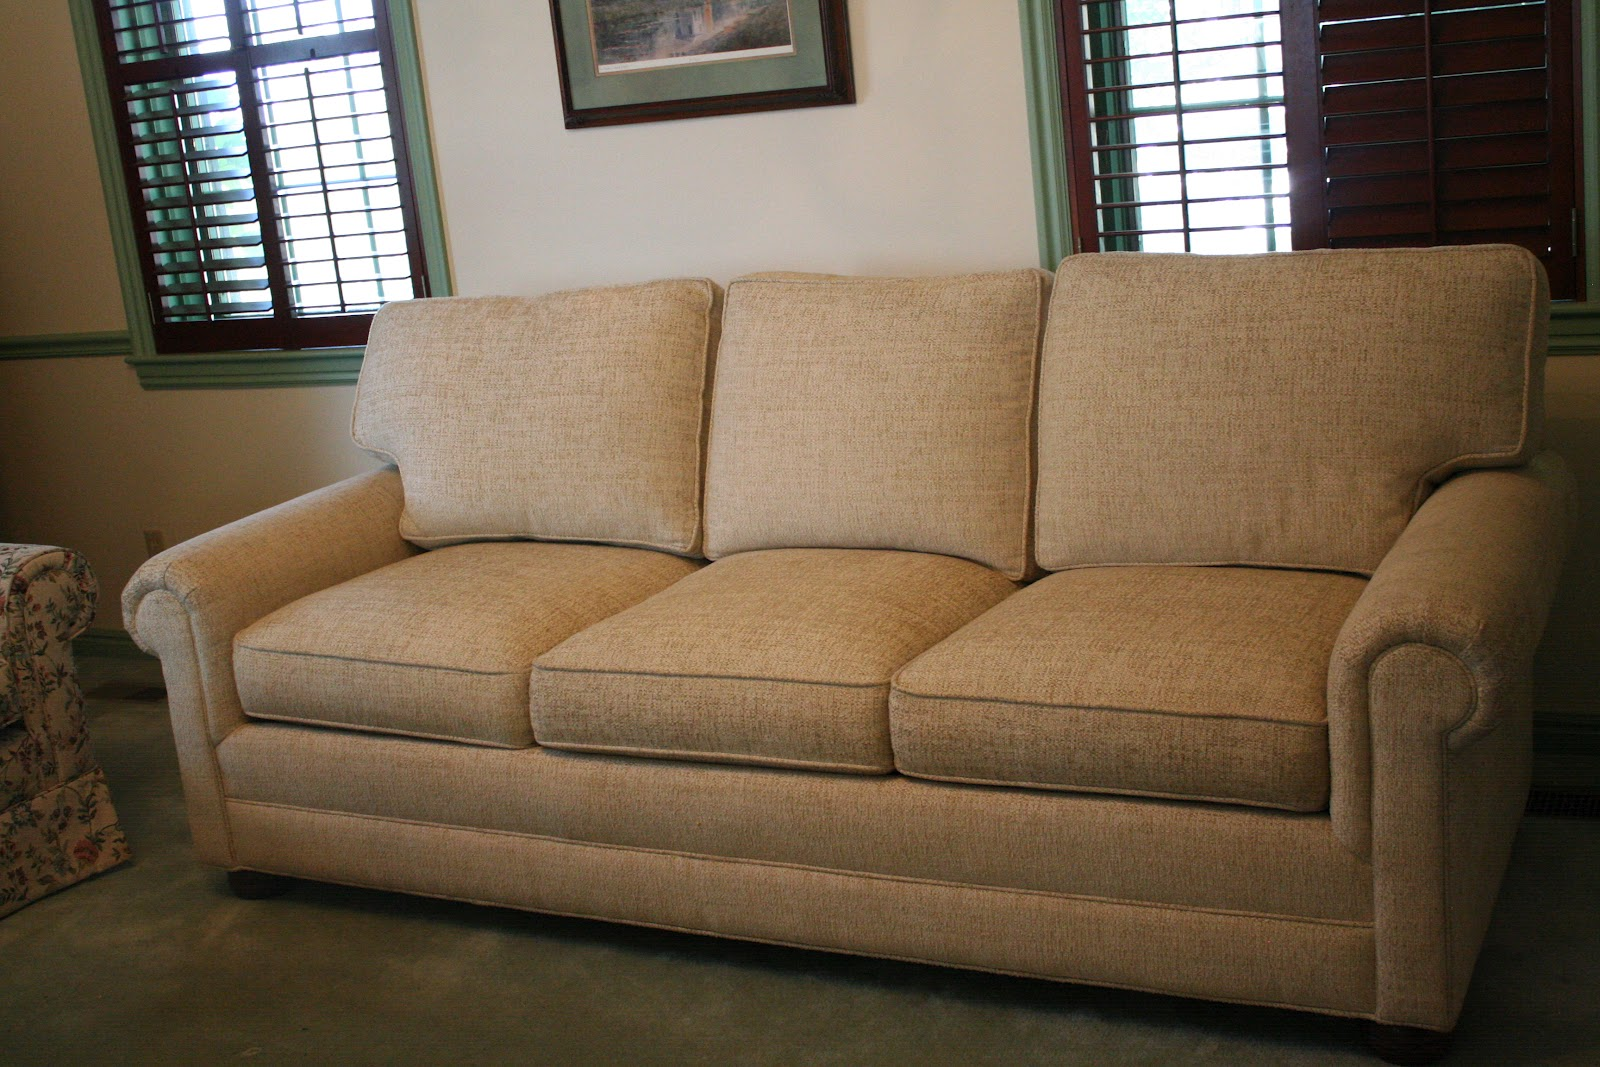 Tan Fabric Sofa Tan Fabric Traditional Sofa Loveseat Set W